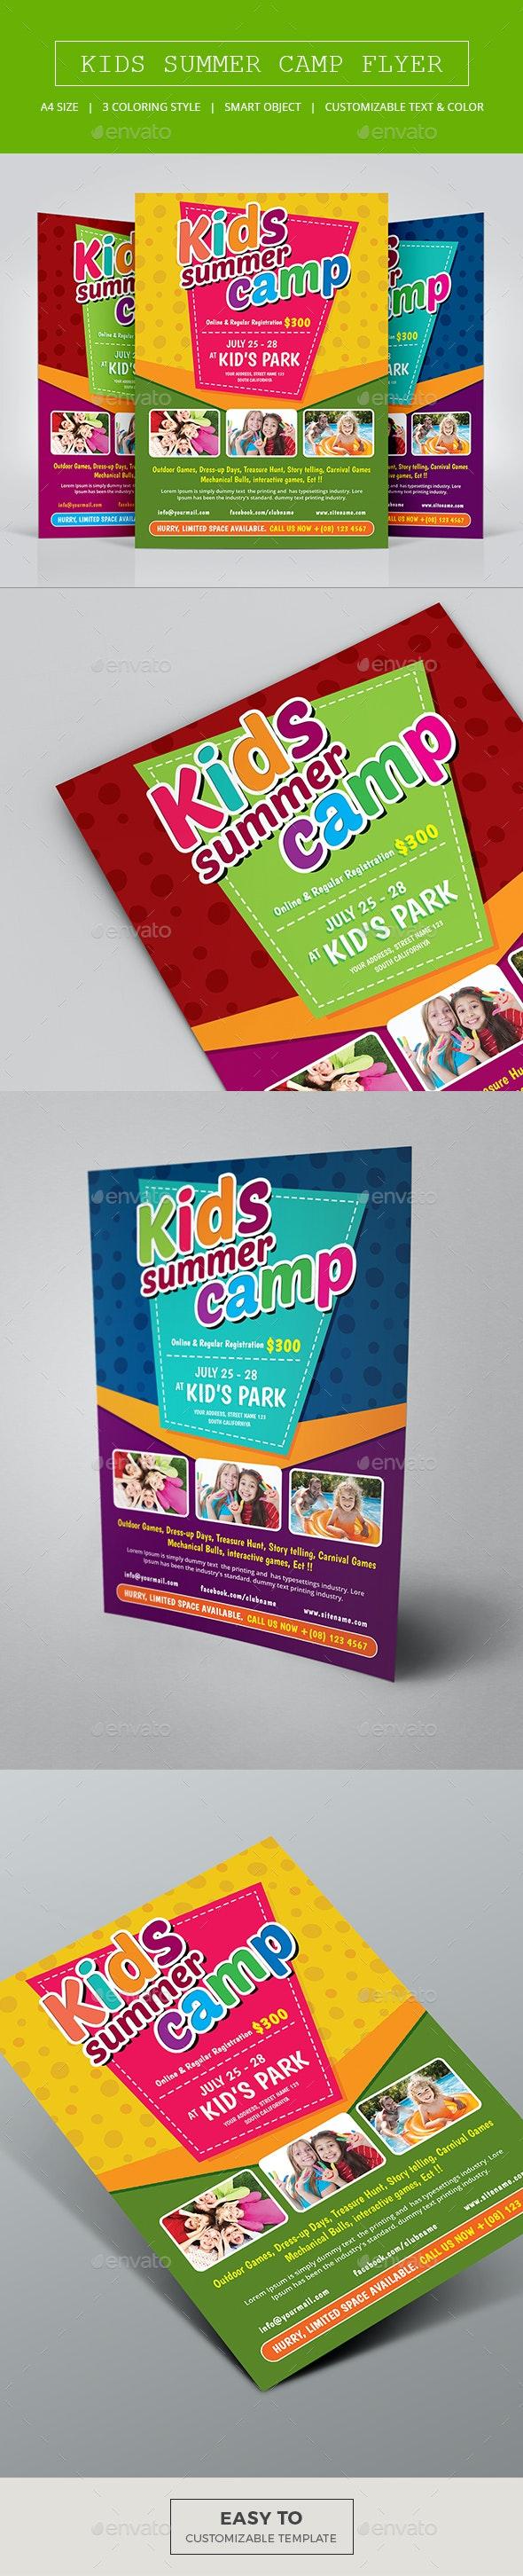 Kids Summer Camp Flyer - Corporate Flyers